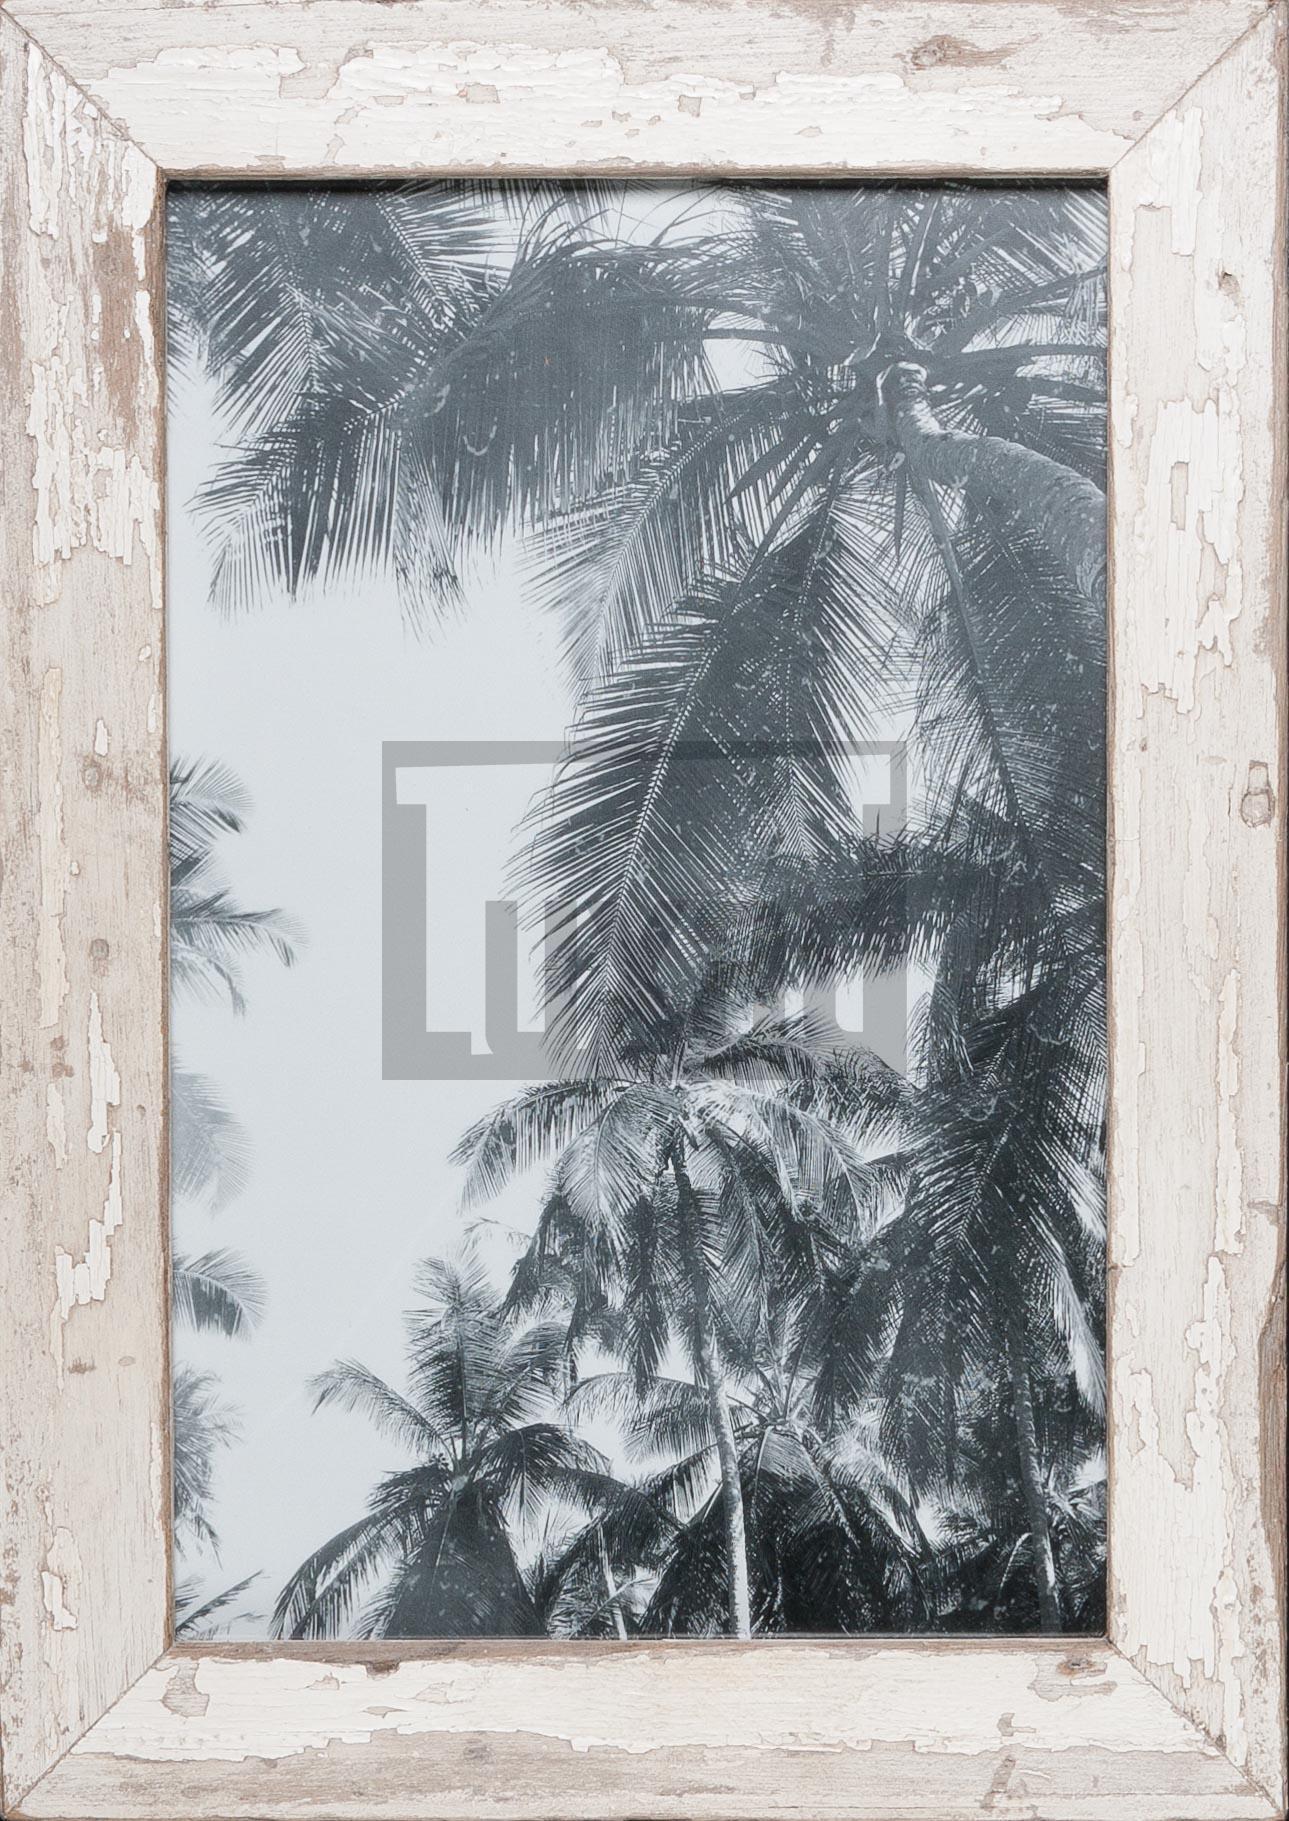 Vintage-Bilderrahmen aus altem Holz für Fotos 25 x 38 cm